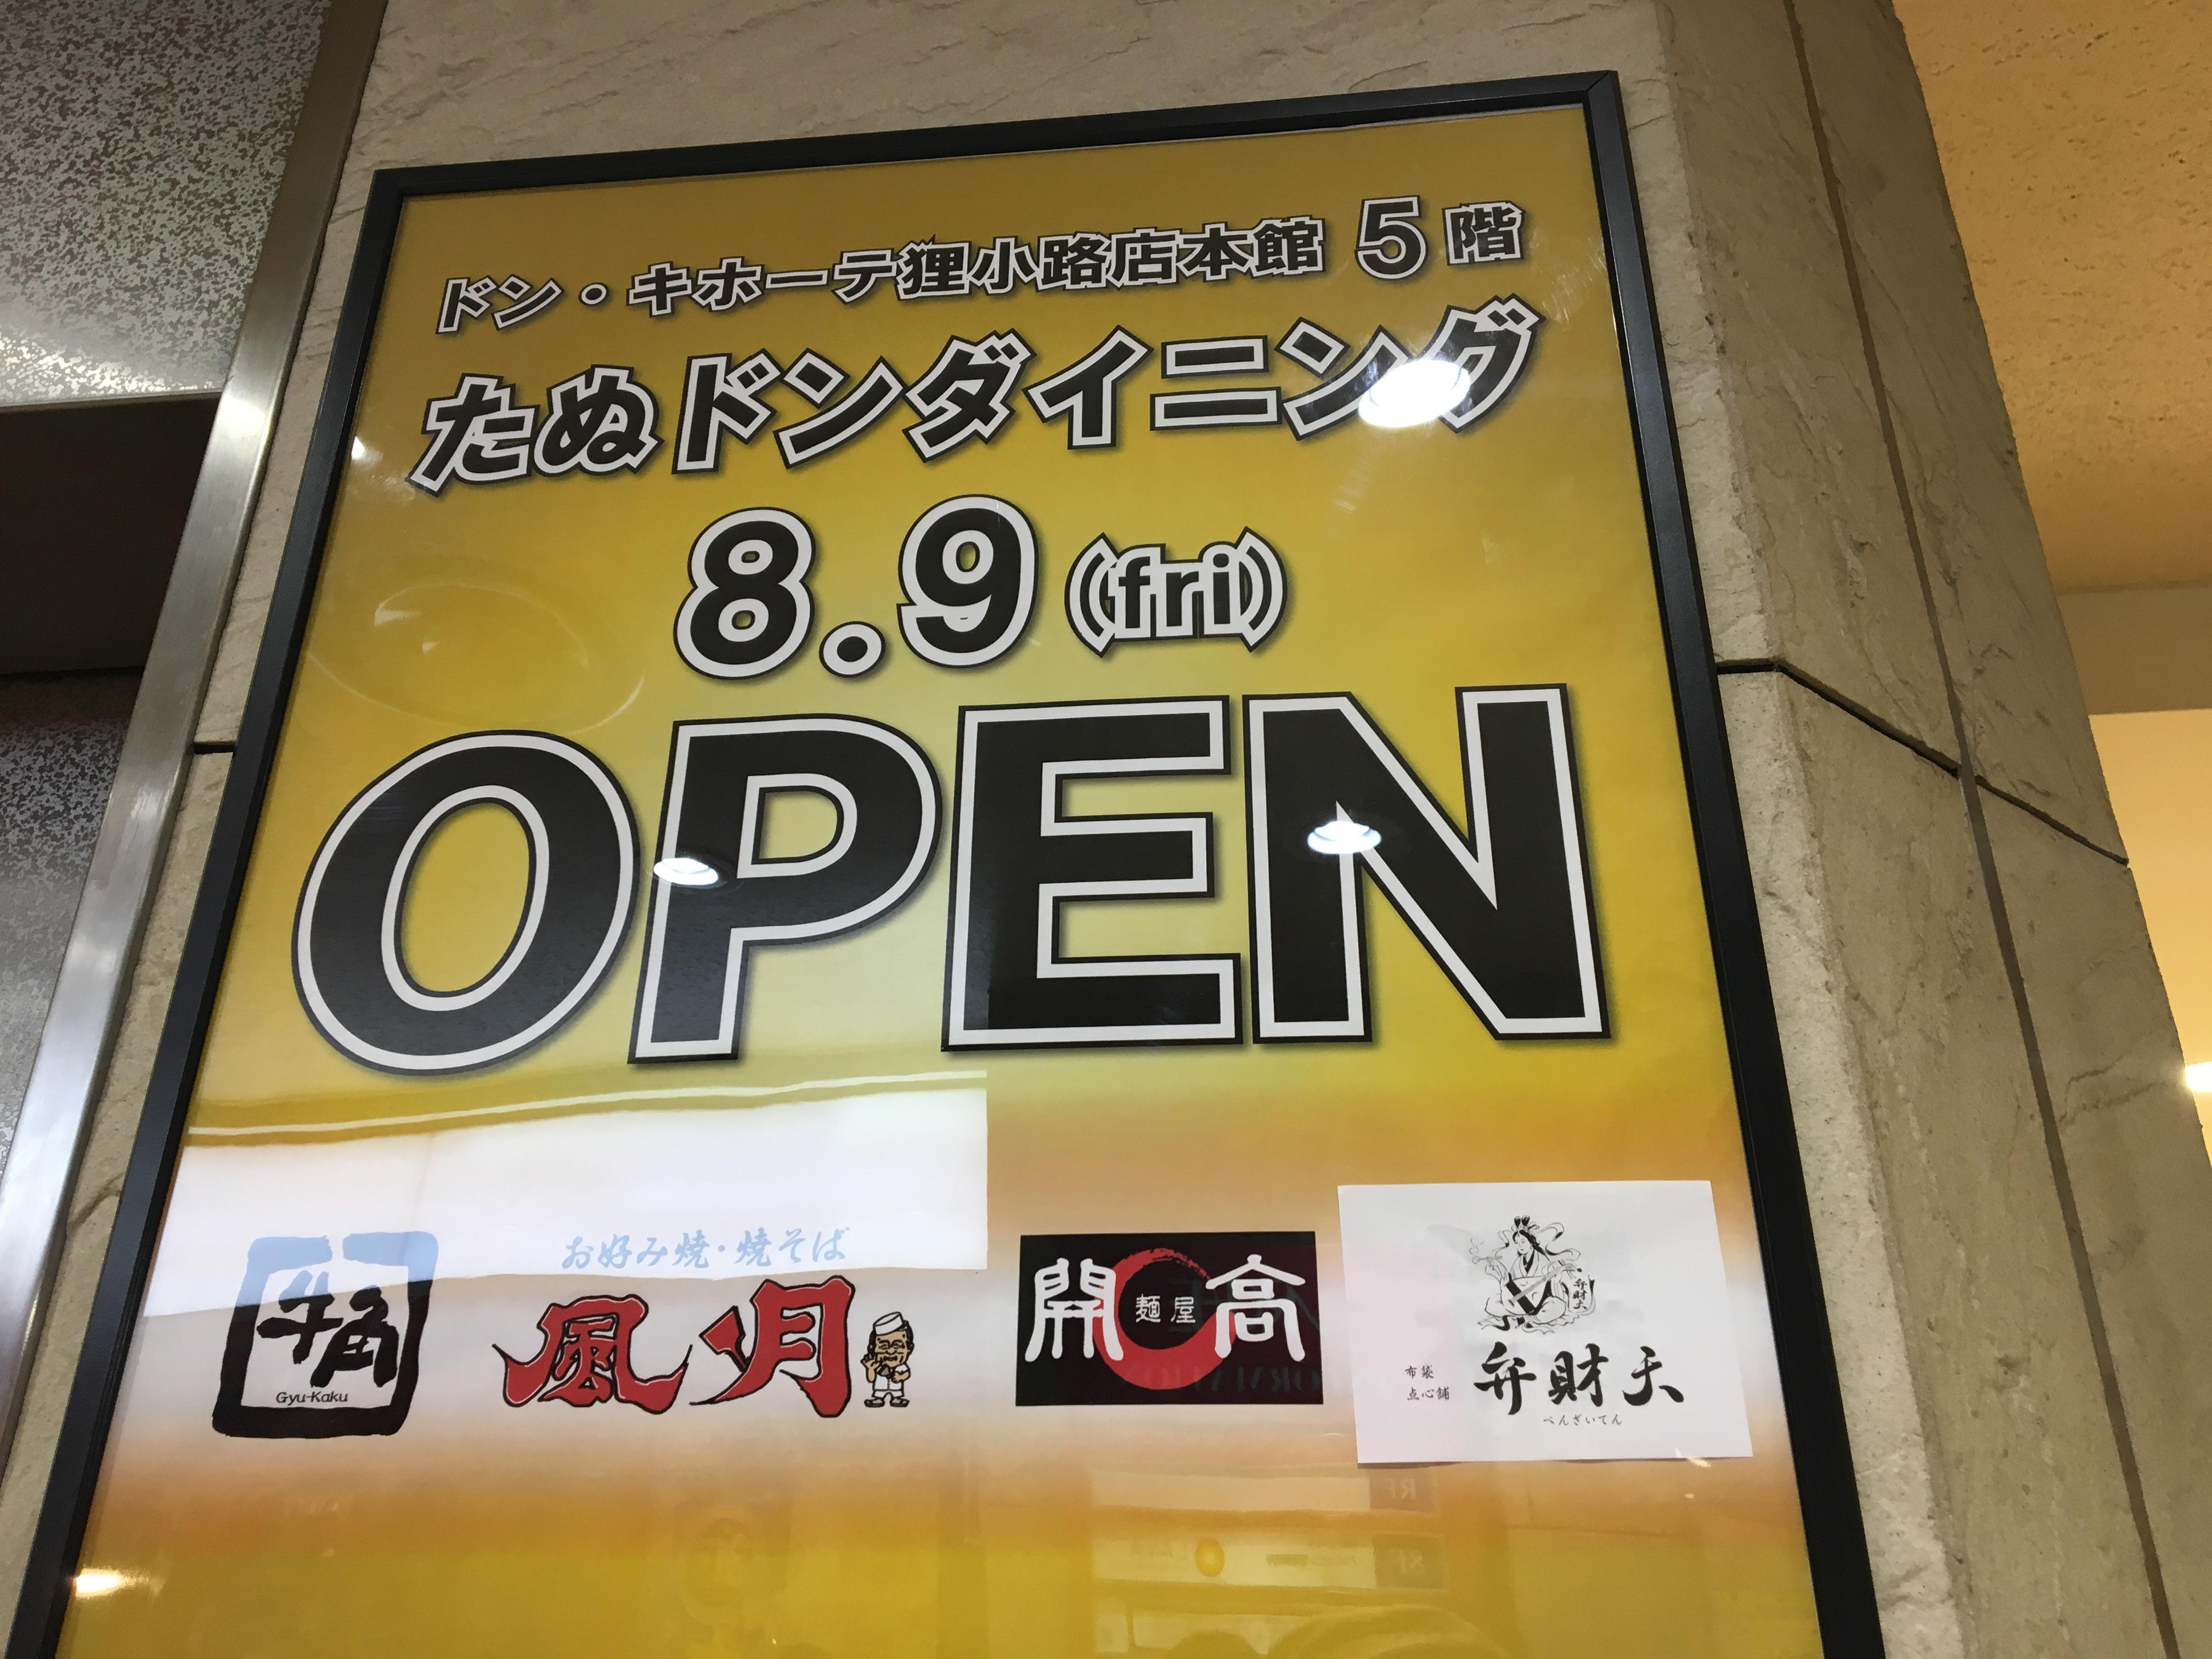 MEGAドン・キホーテ札幌狸小路本店の5階に、飲食店が集まるたぬドンダイニングが8月9日(金)にオープン